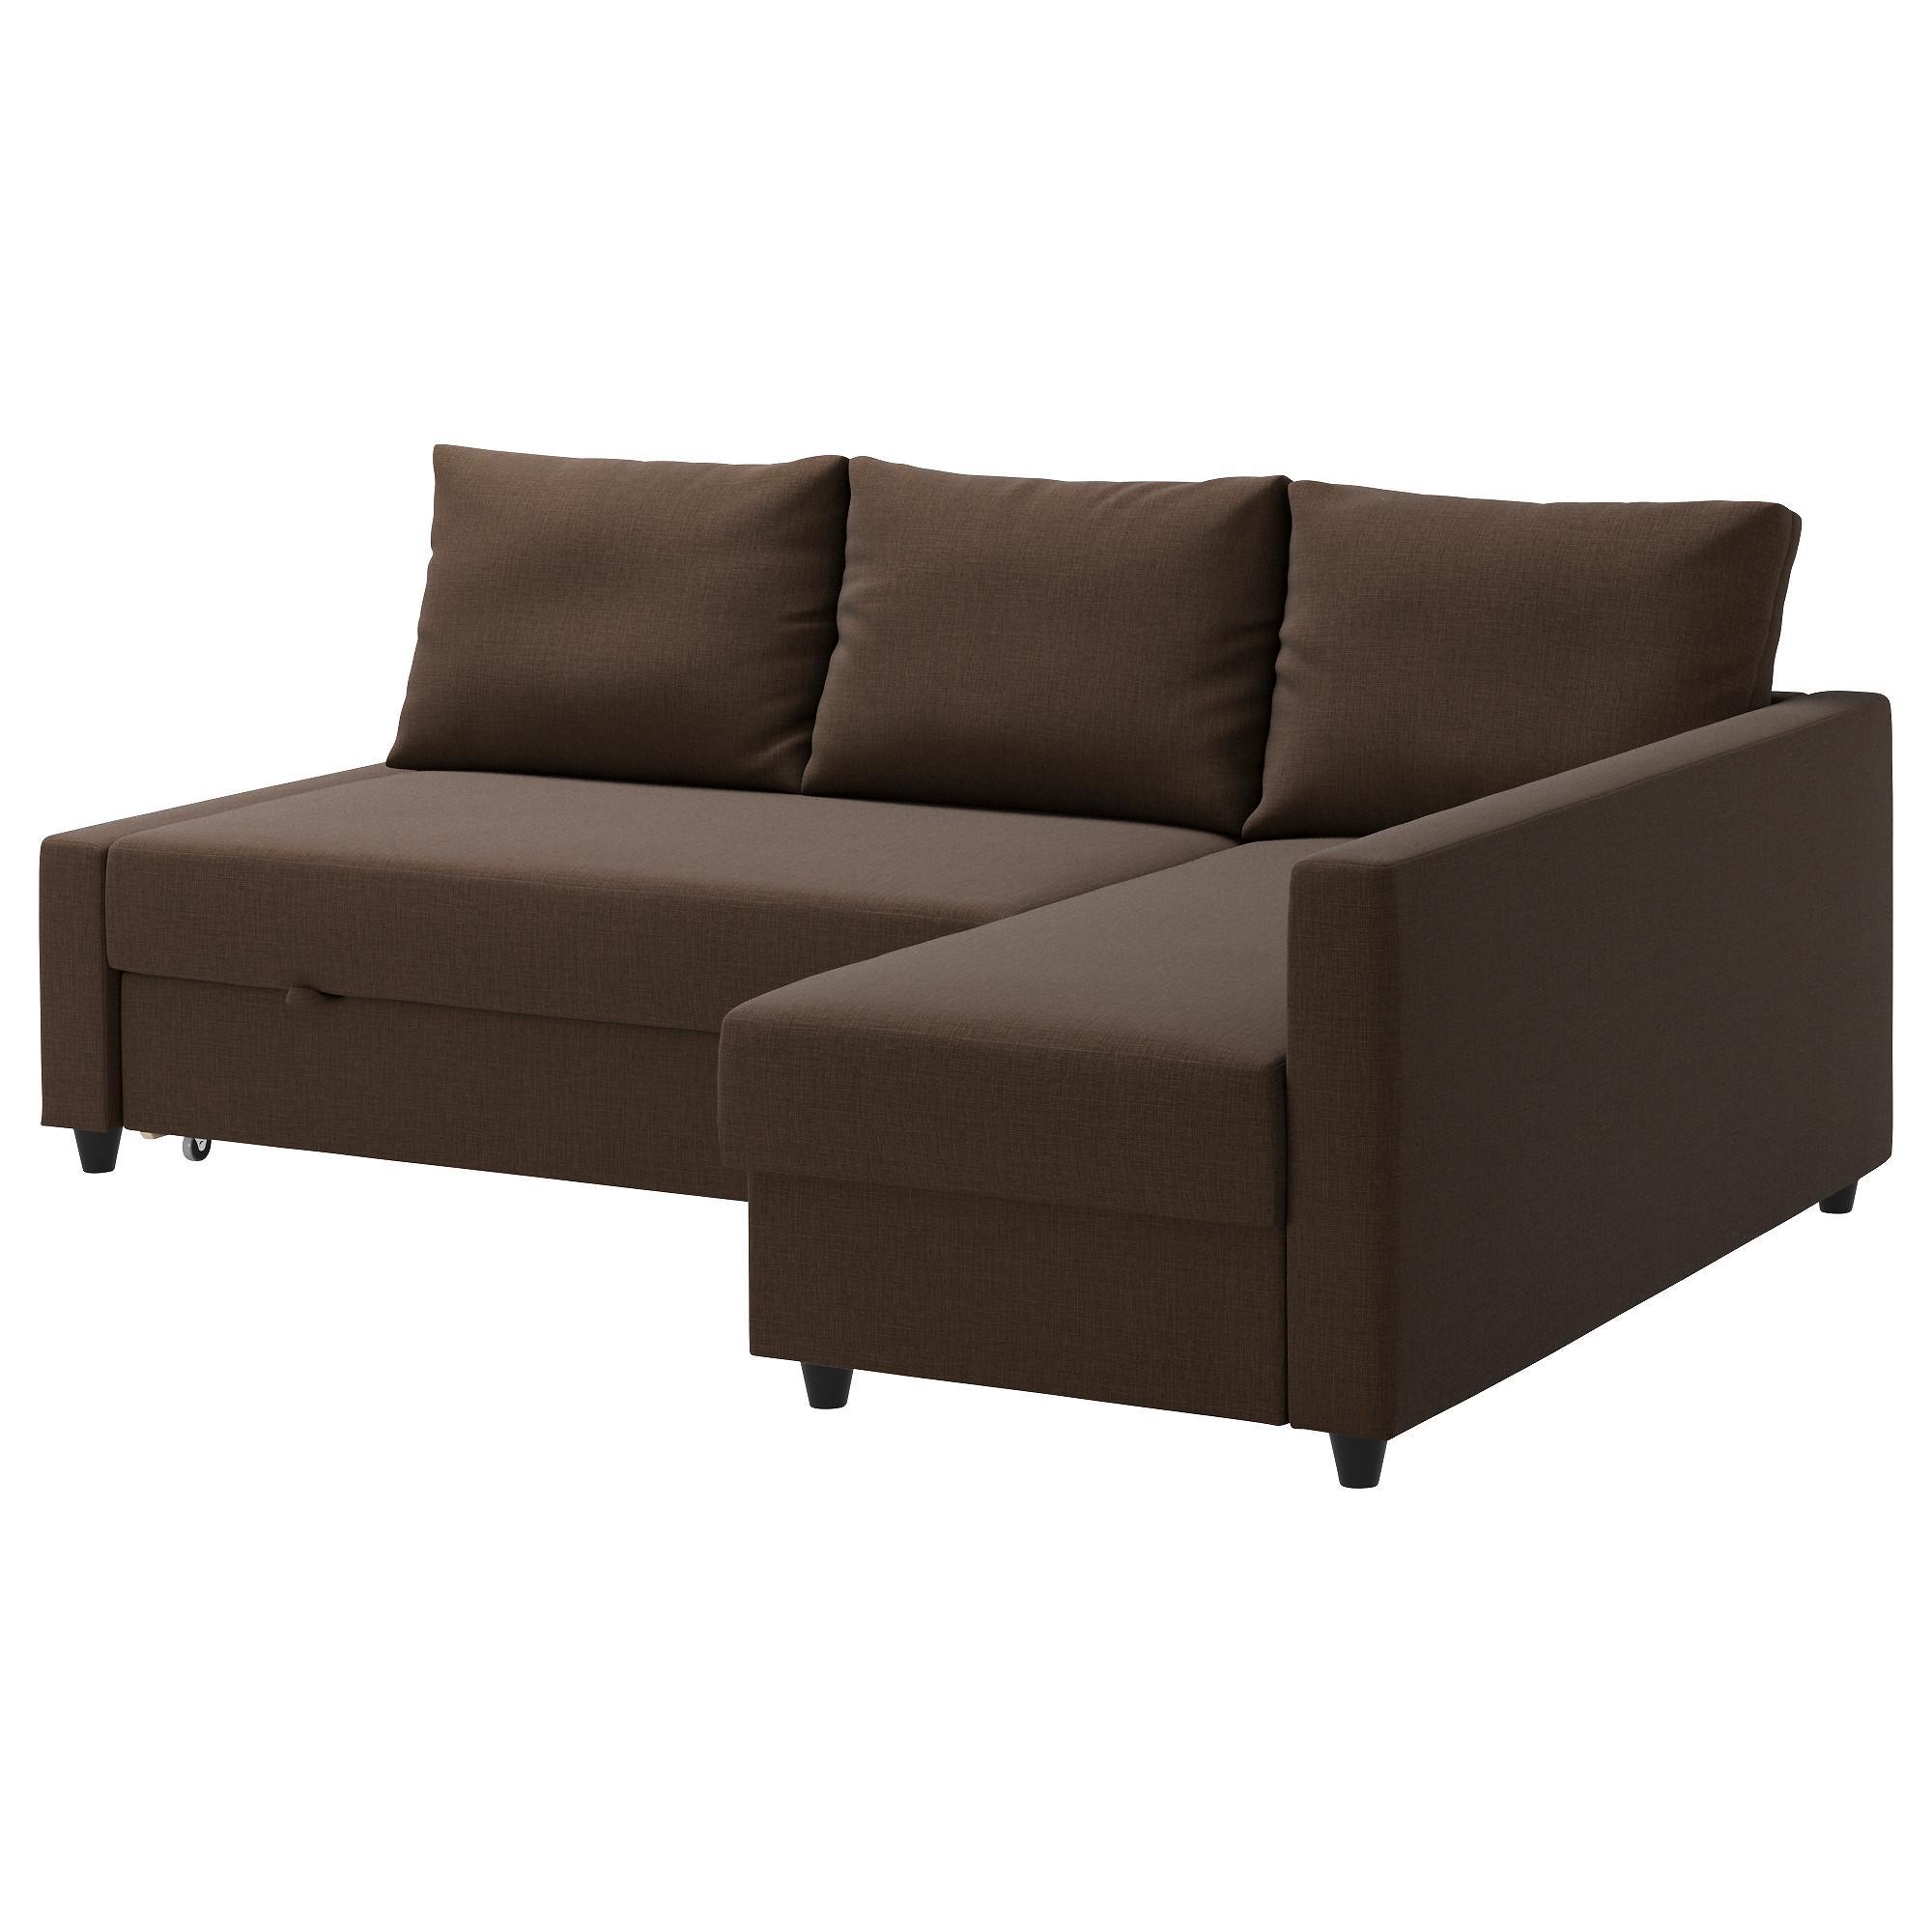 Friheten Corner Sofa Bed With Storage Skiftebo Brown – Ikea With Regard To Storage Sofas Ikea (View 6 of 20)